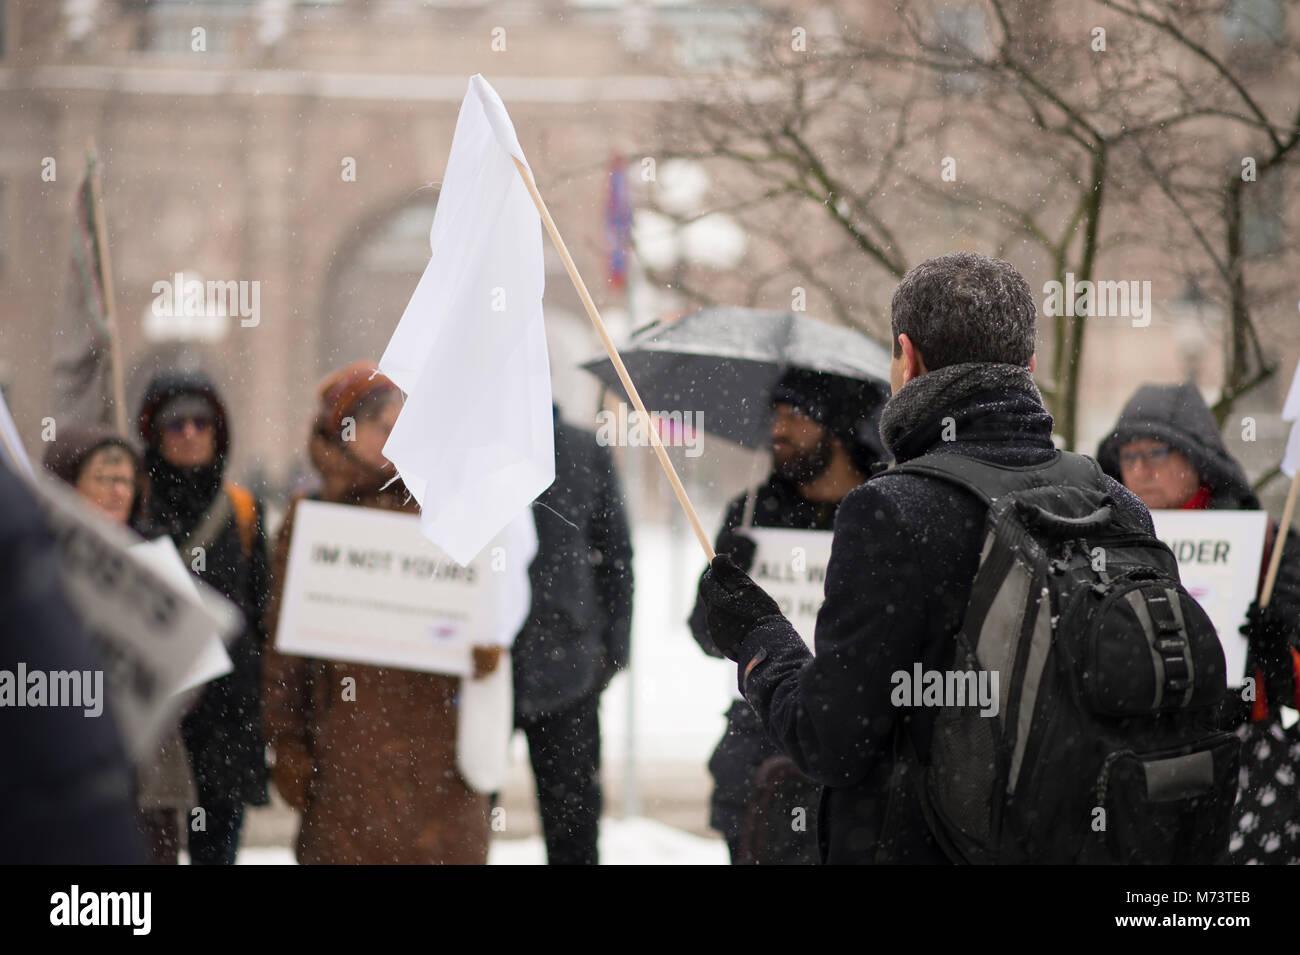 Stockholm, Sweden, March 8, 2018. International Women's Day. The National Association GAPF: manifestation for - Stock Image